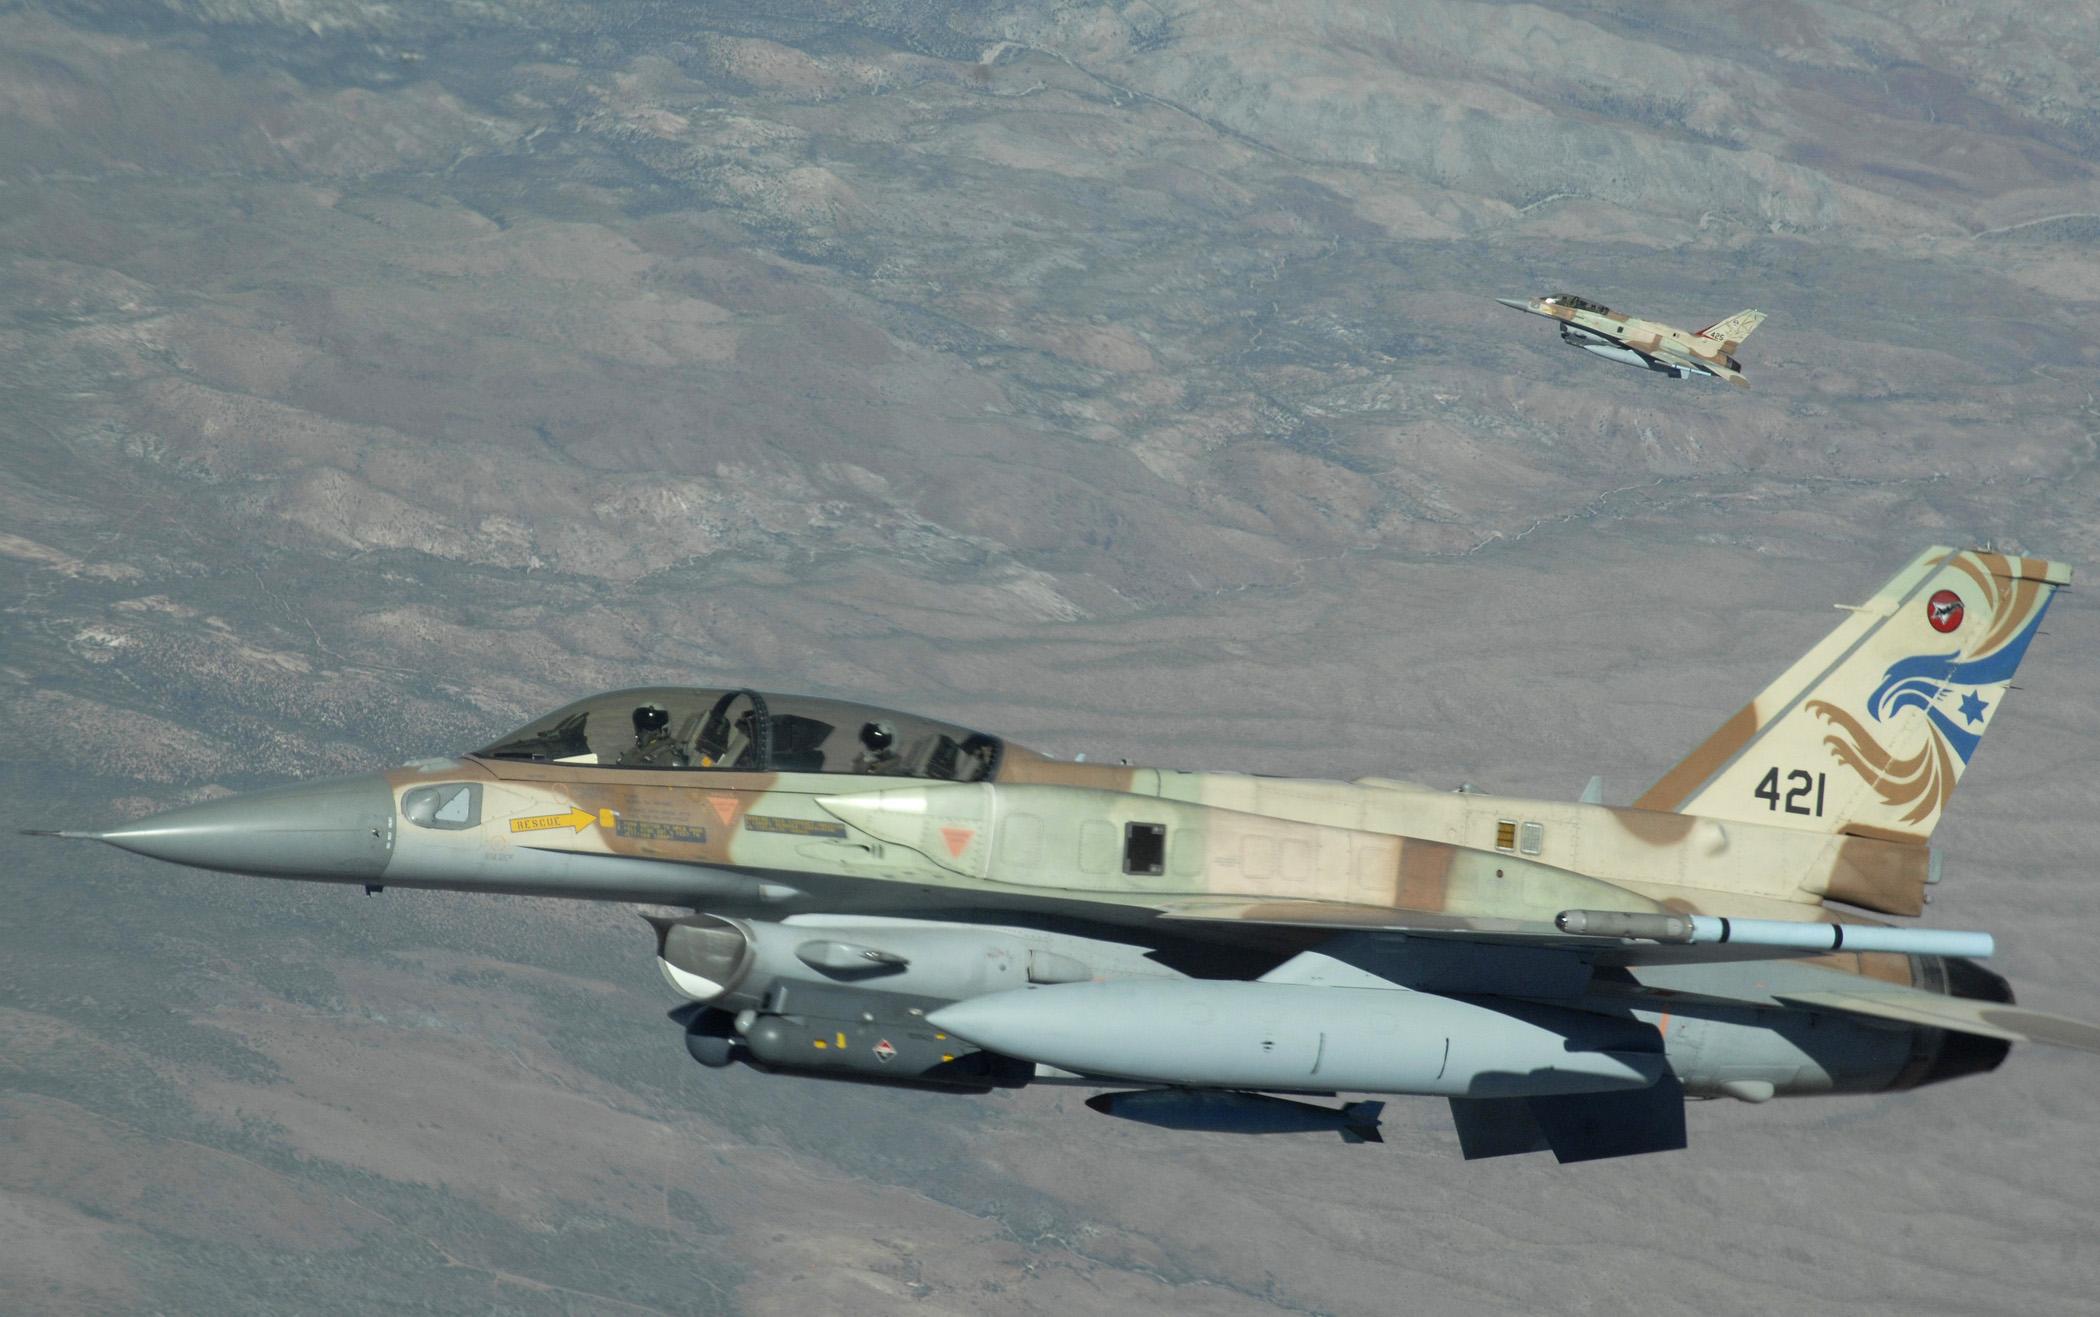 Resultado de imagem para f-16 israelense